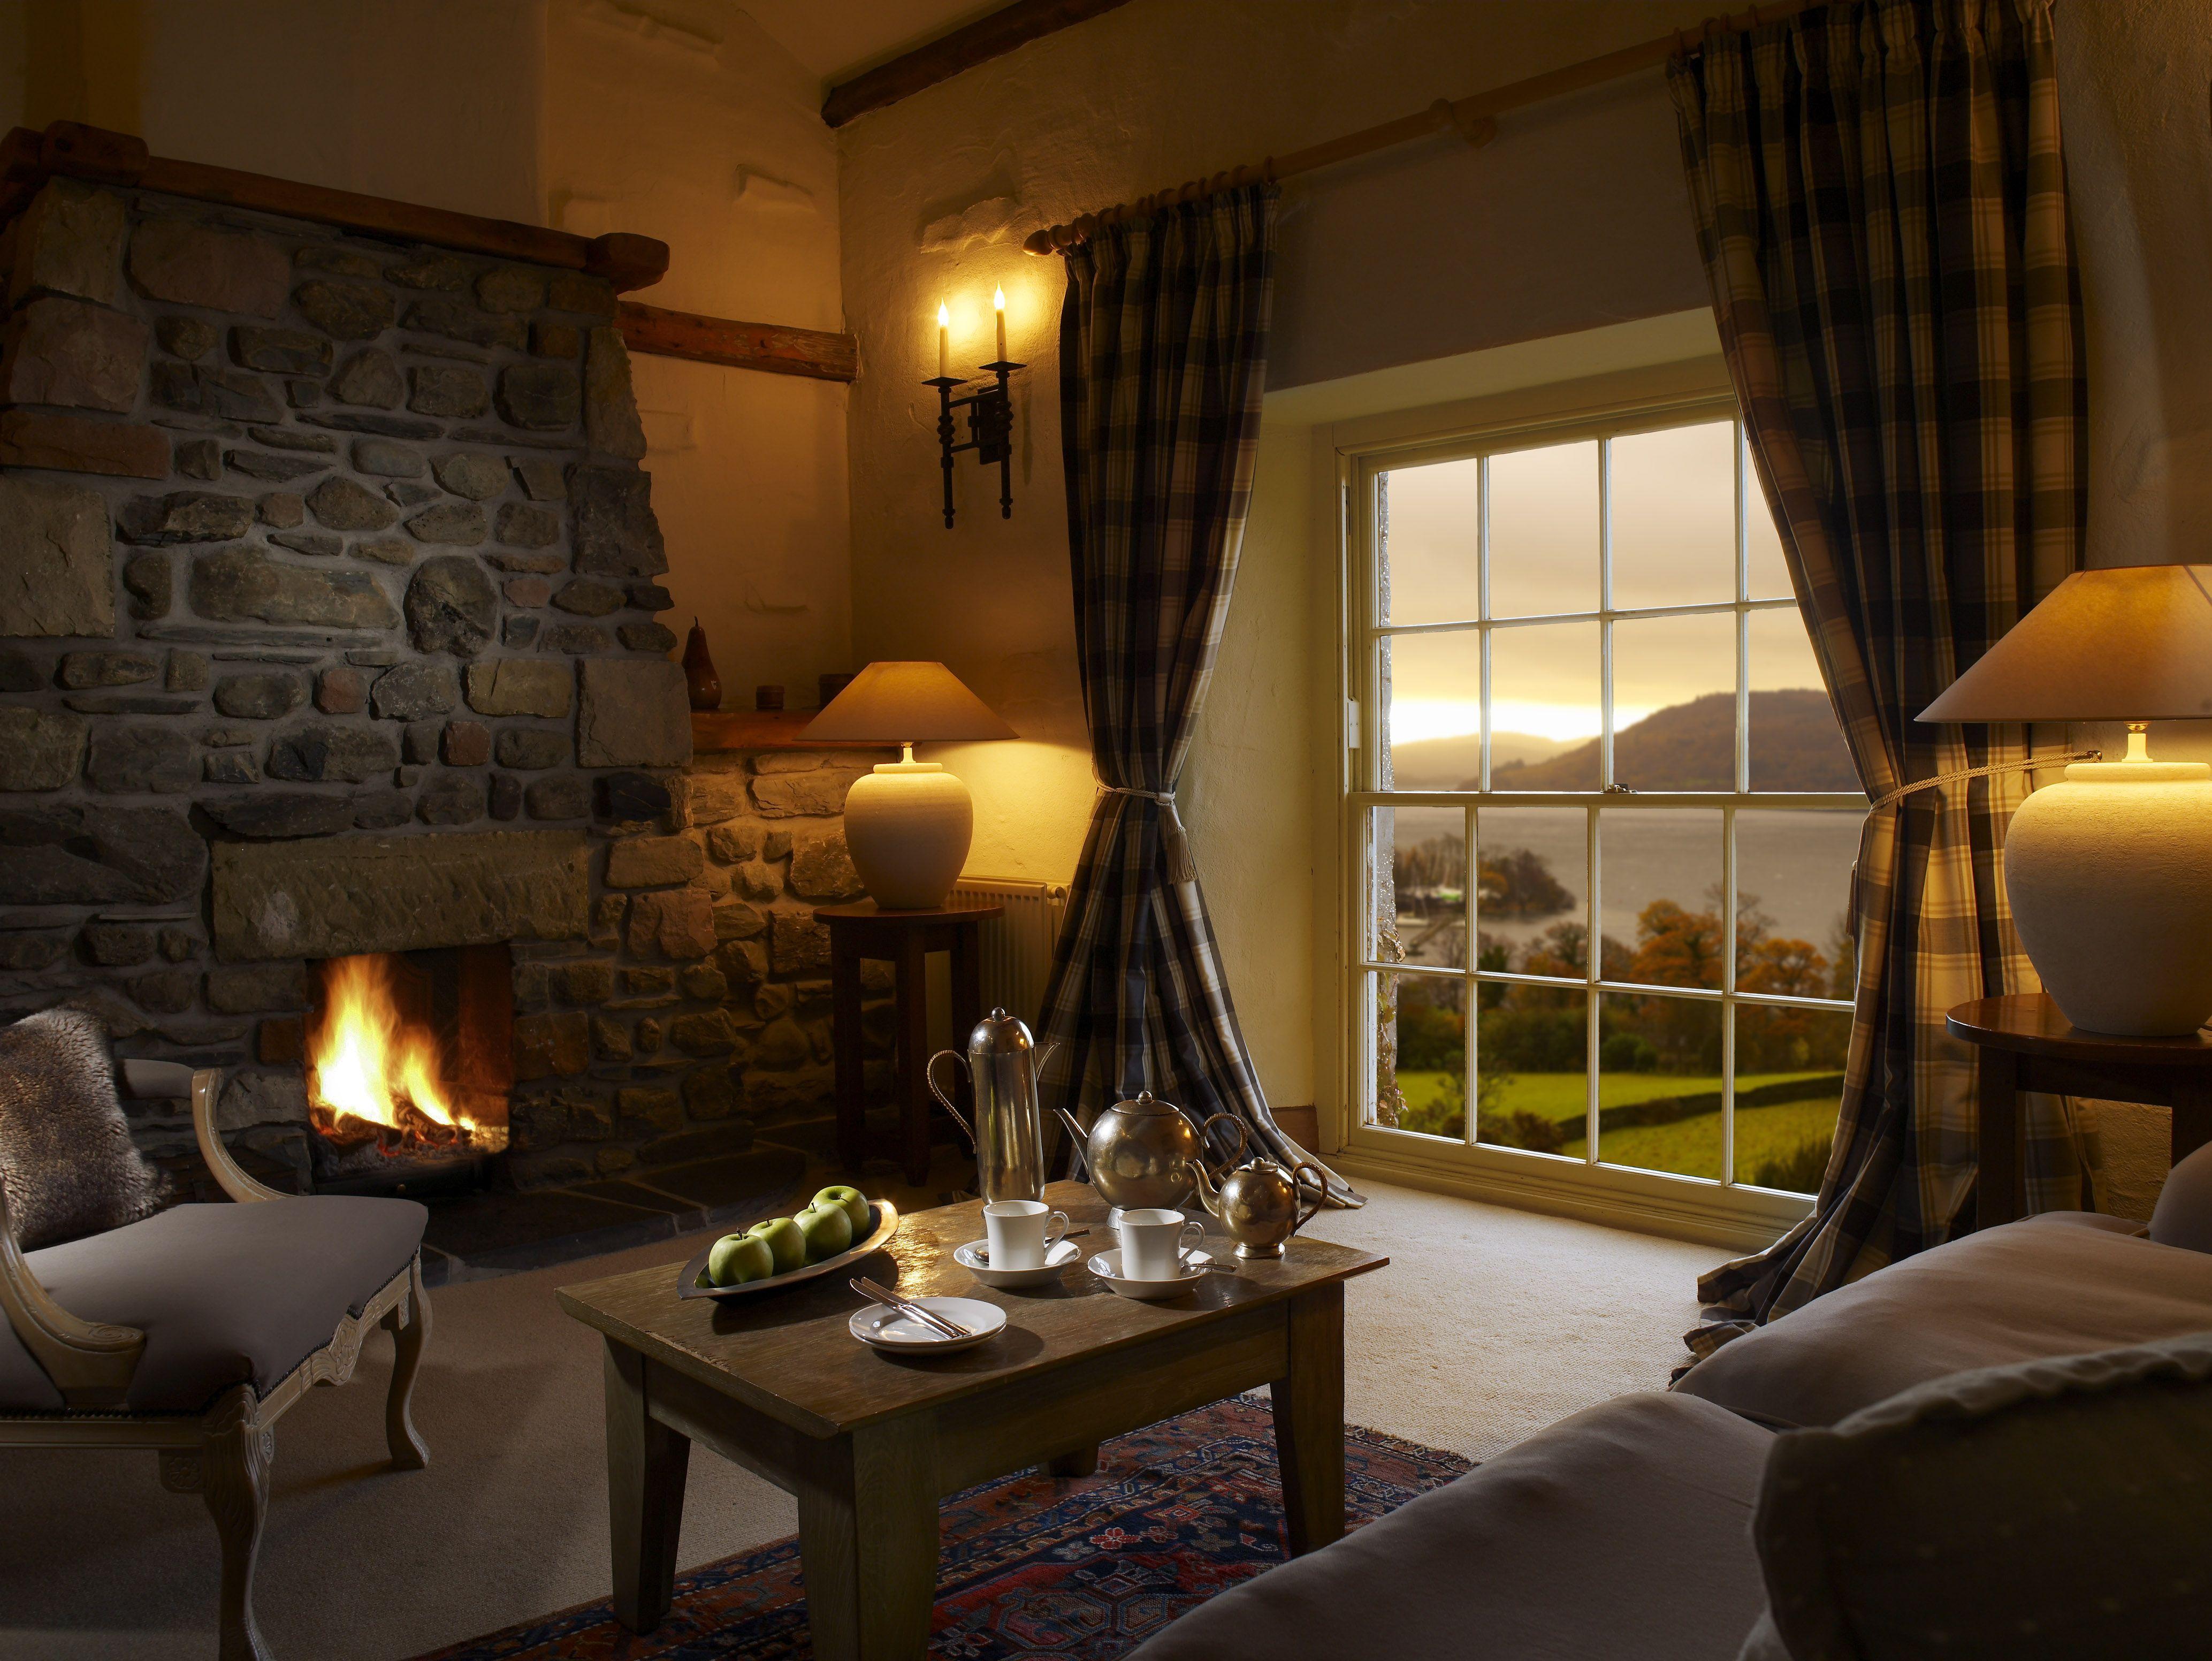 The Five Star Samling Hotel In Lake District Uk